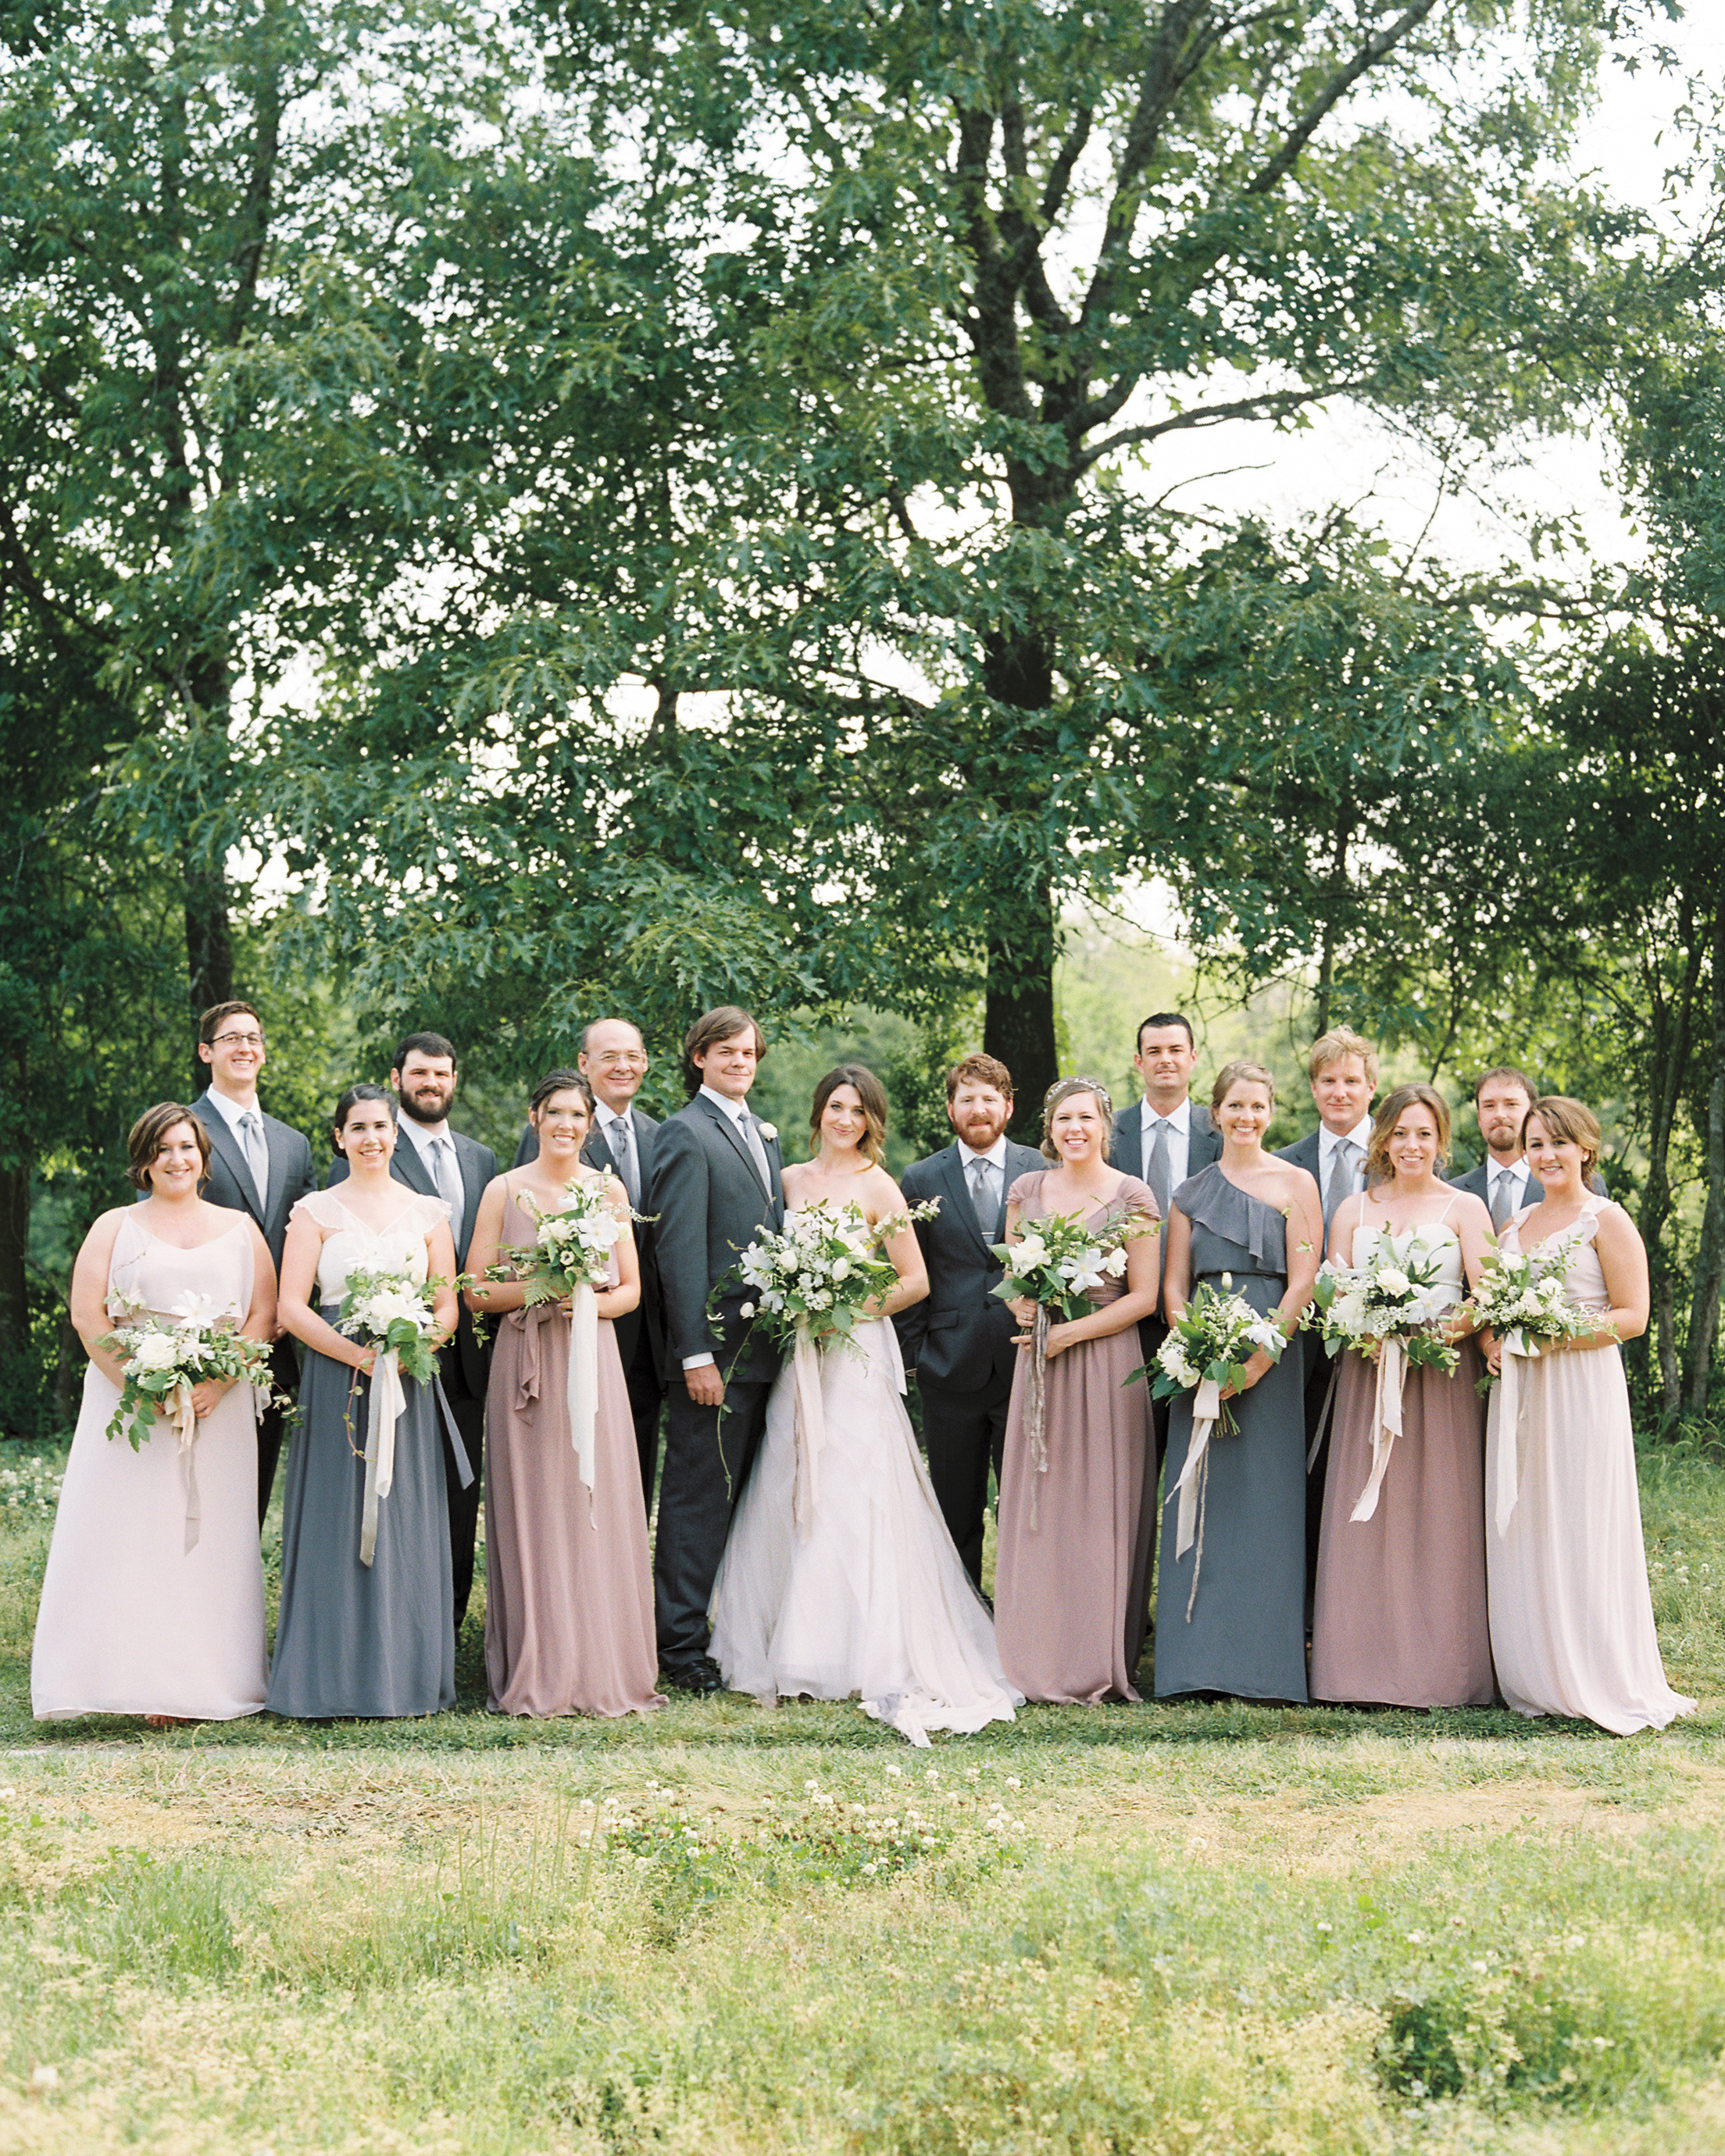 saron-neal-wedding-mississippi-00108-s111701.jpg